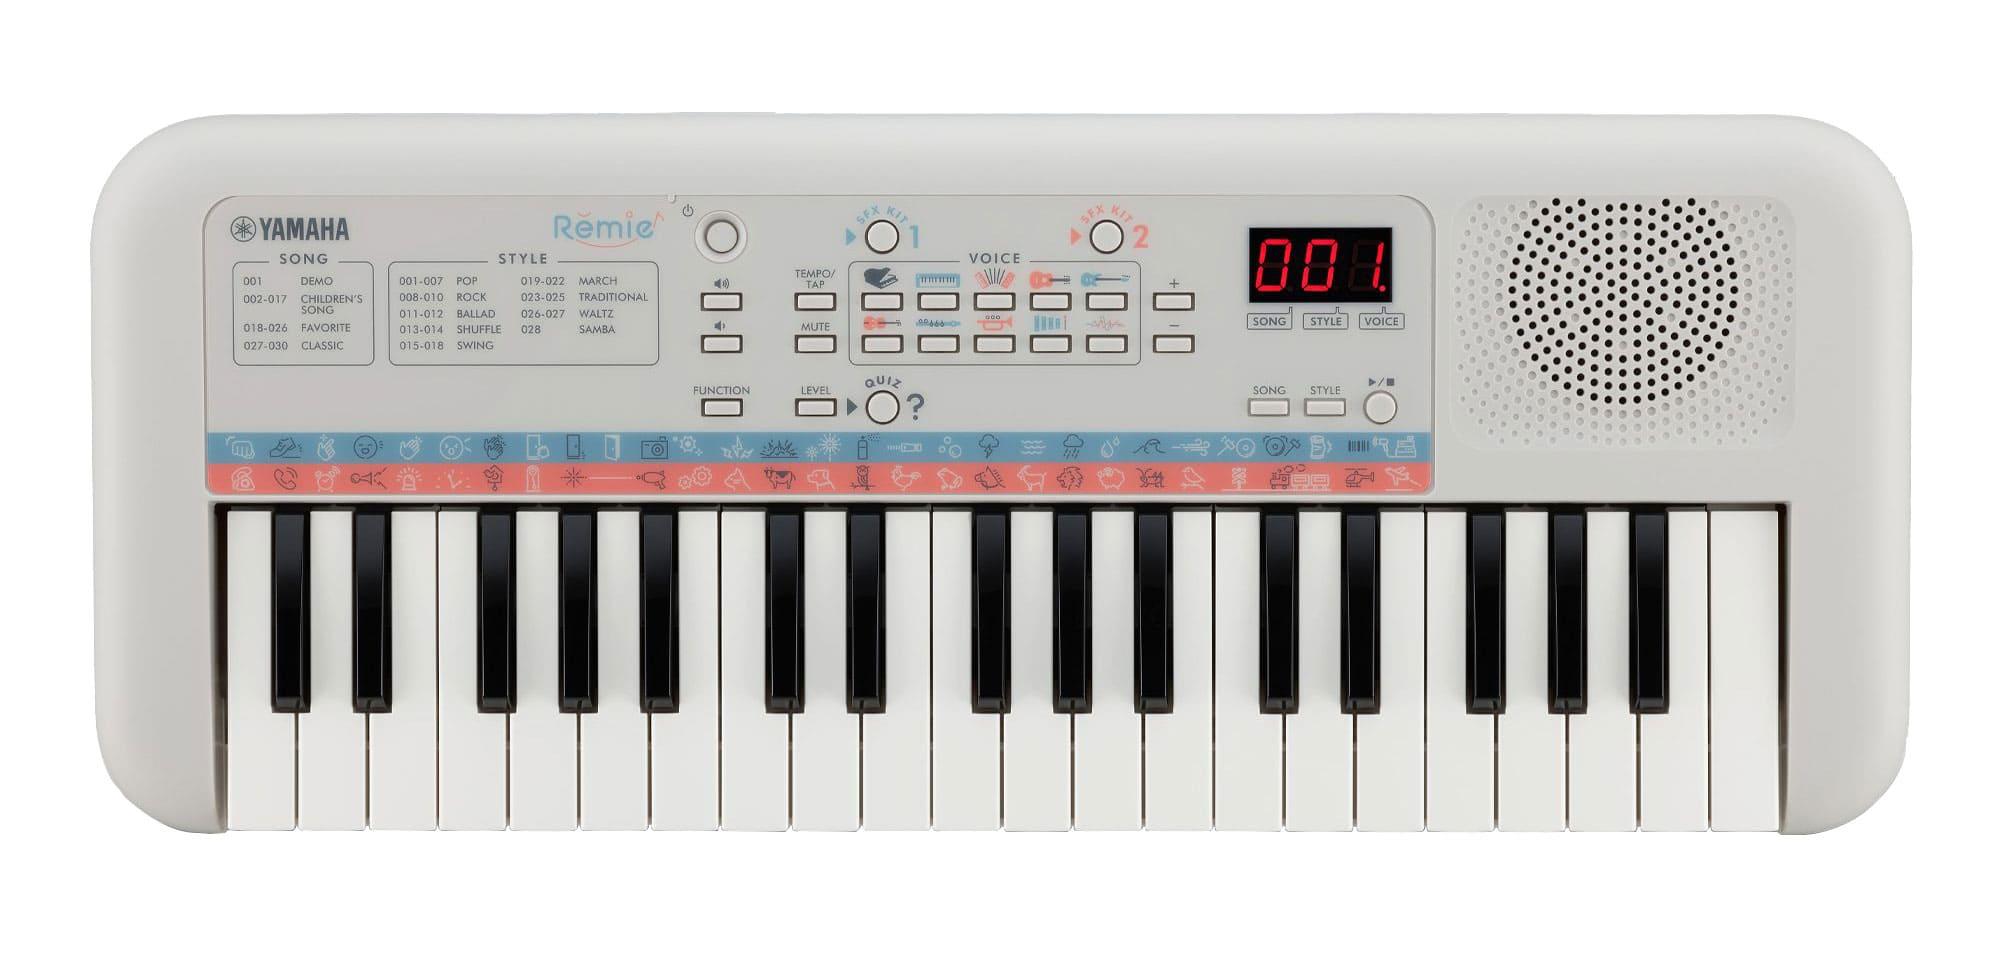 Homekeyboards - Yamaha Remie PSS E30 Keyboard - Onlineshop Musikhaus Kirstein